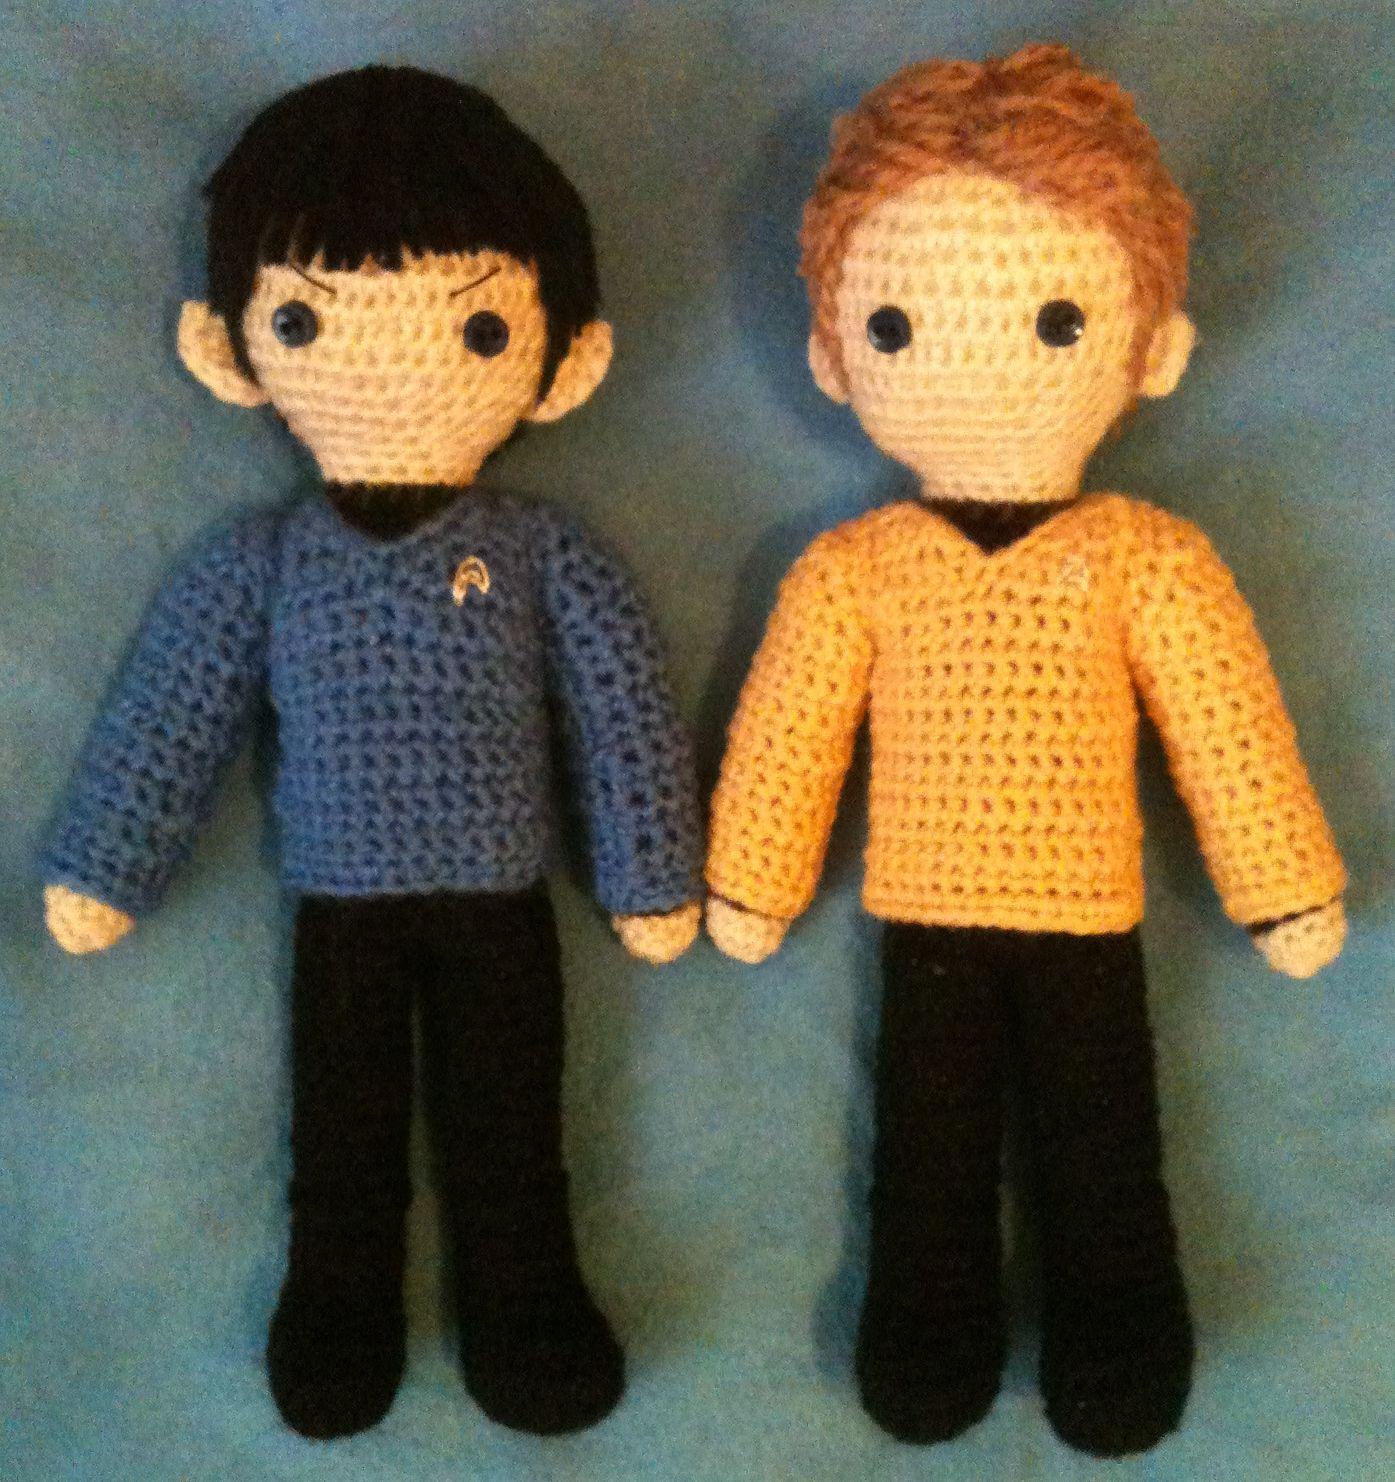 Star Trek amigurumi - Spock and Kirk | My Amigurumi | Pinterest ...